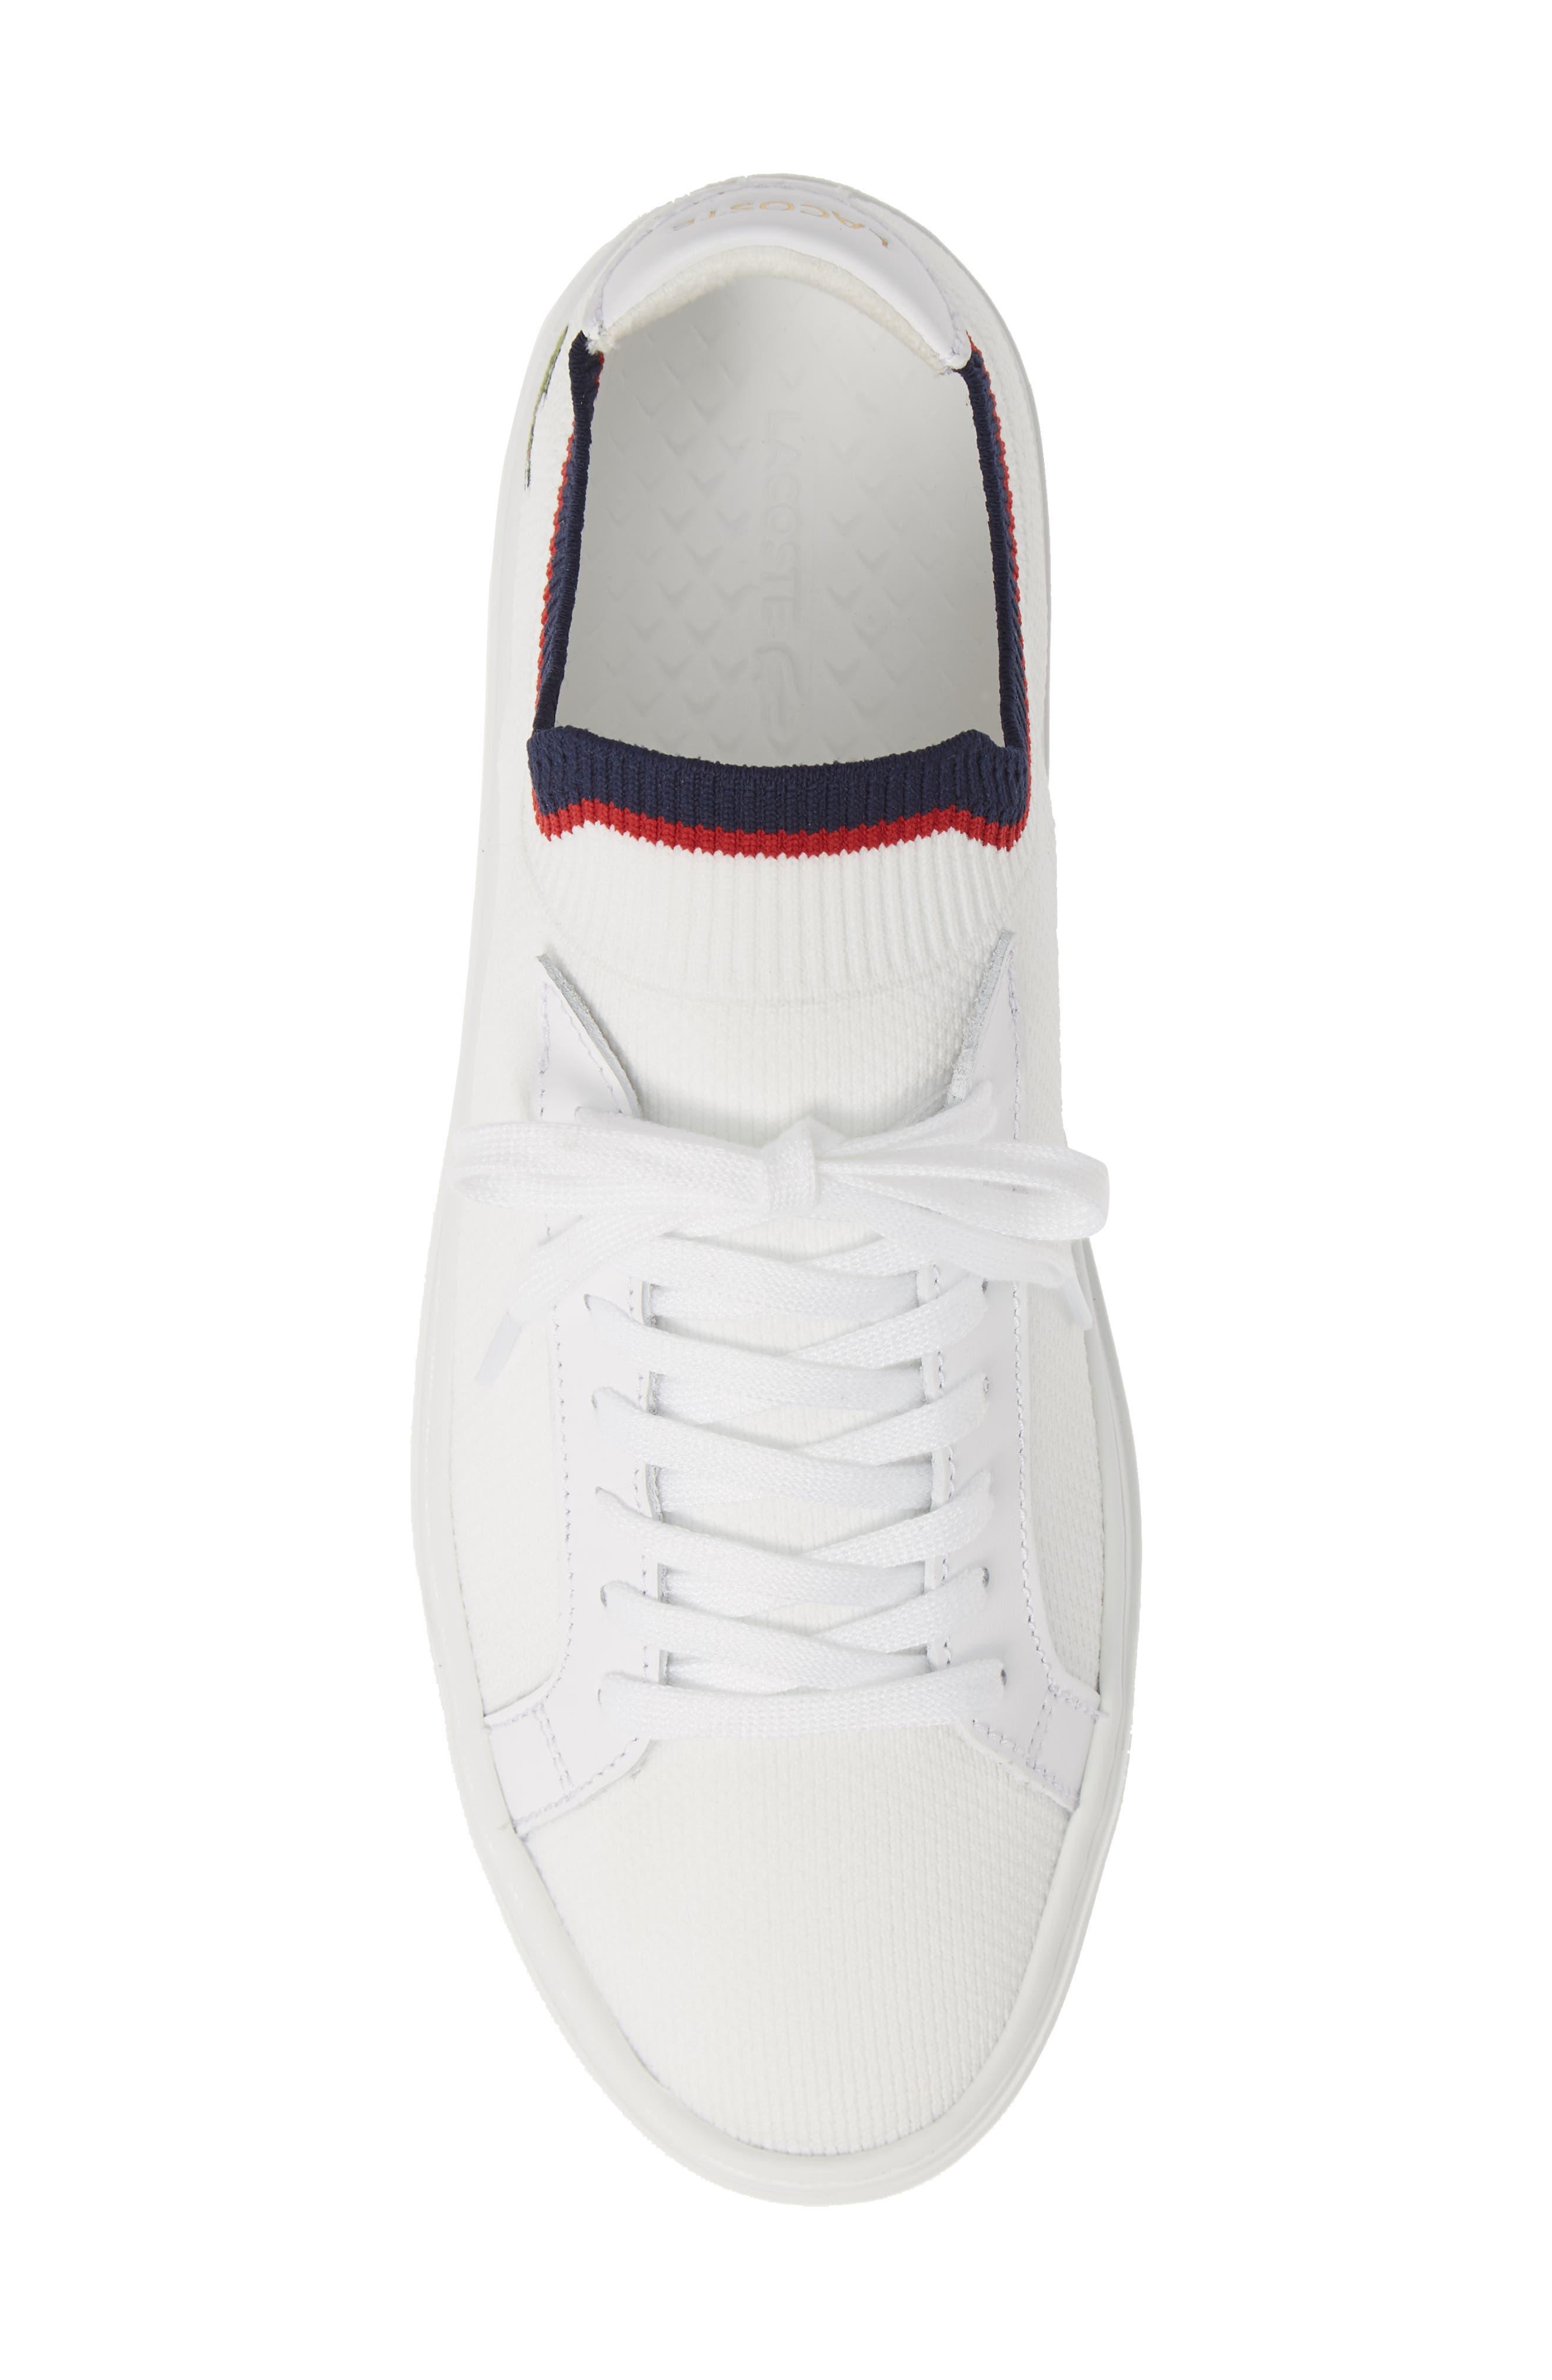 LACOSTE, Piqué Knit Sneaker, Alternate thumbnail 5, color, WHITE/ NAVY/ RED